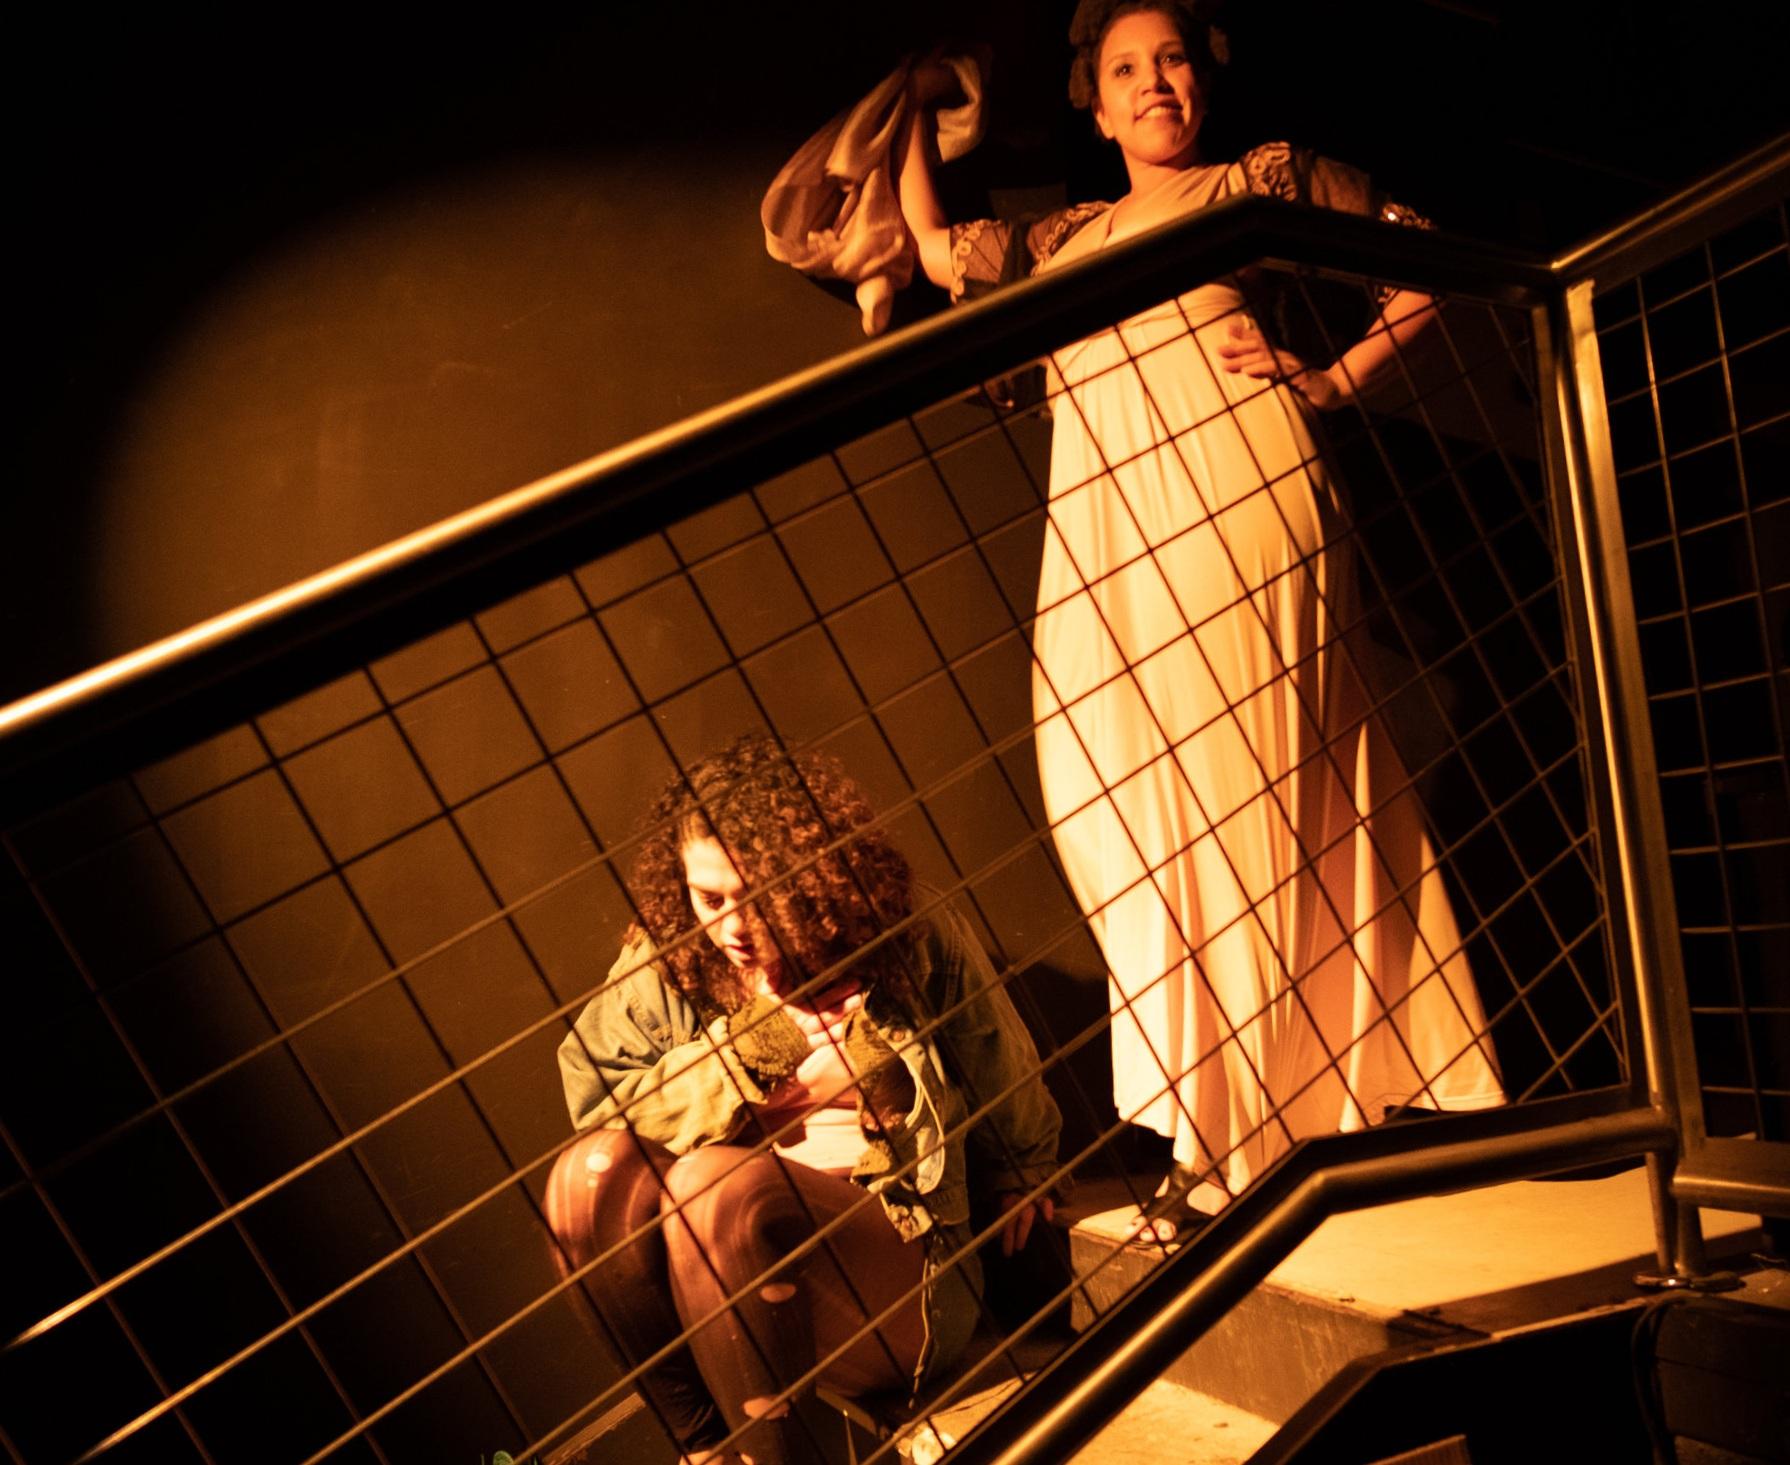 Box Collective Presents - Hurricane Sleep at IATI THEATRE / Character - Ome/ Photo Credit - Yuki Ledbetter